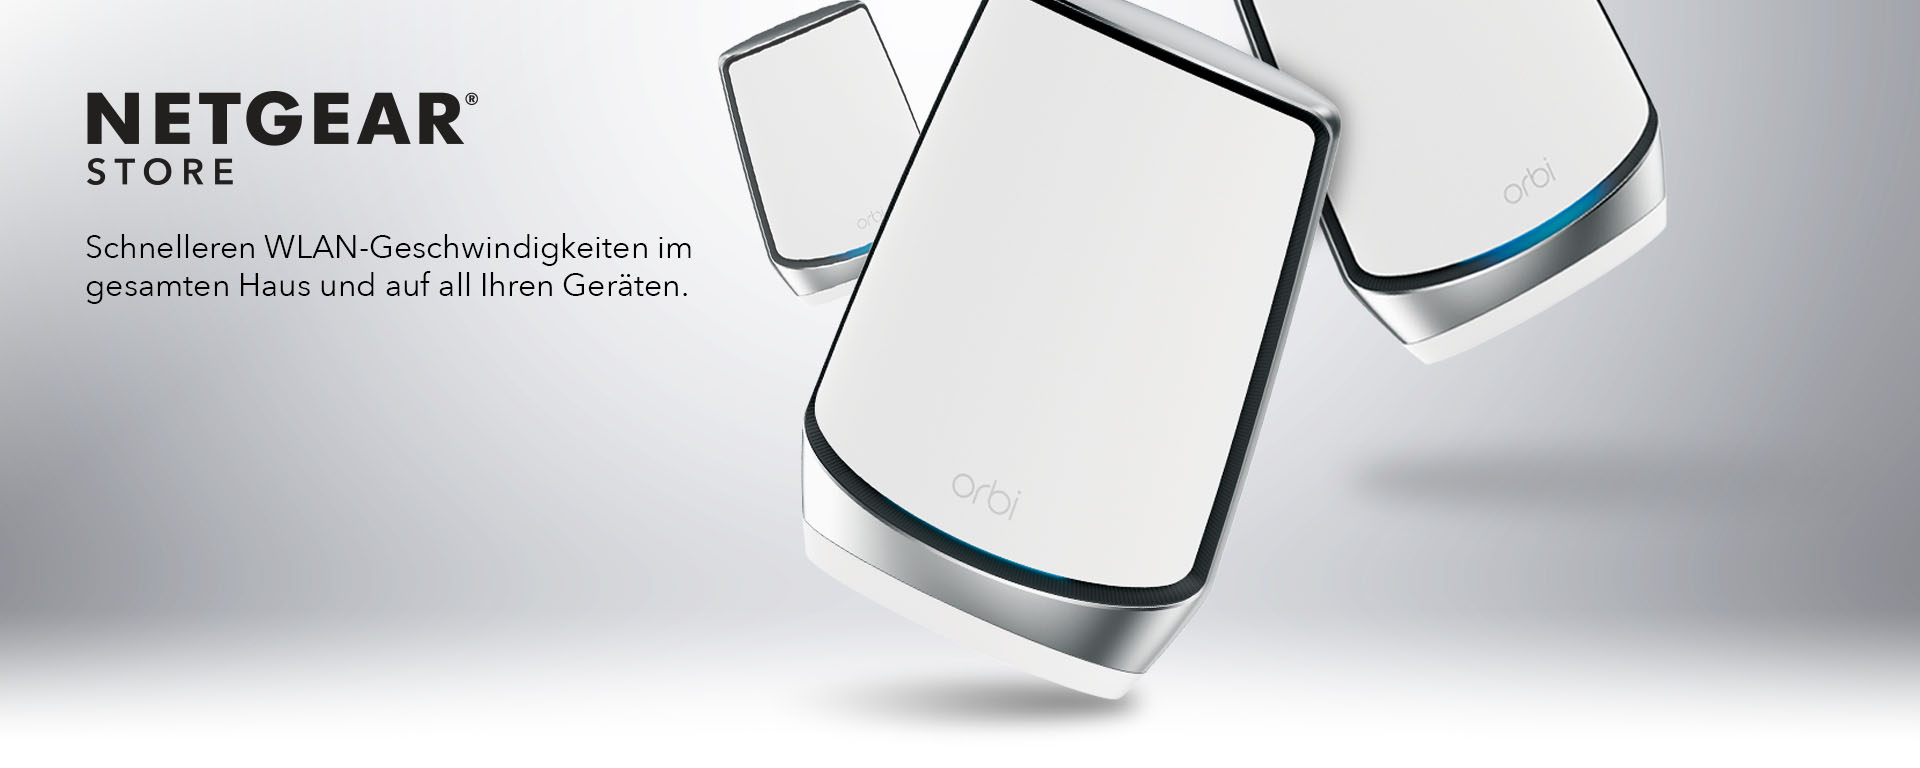 Netgear Mesh WiFi Systeme